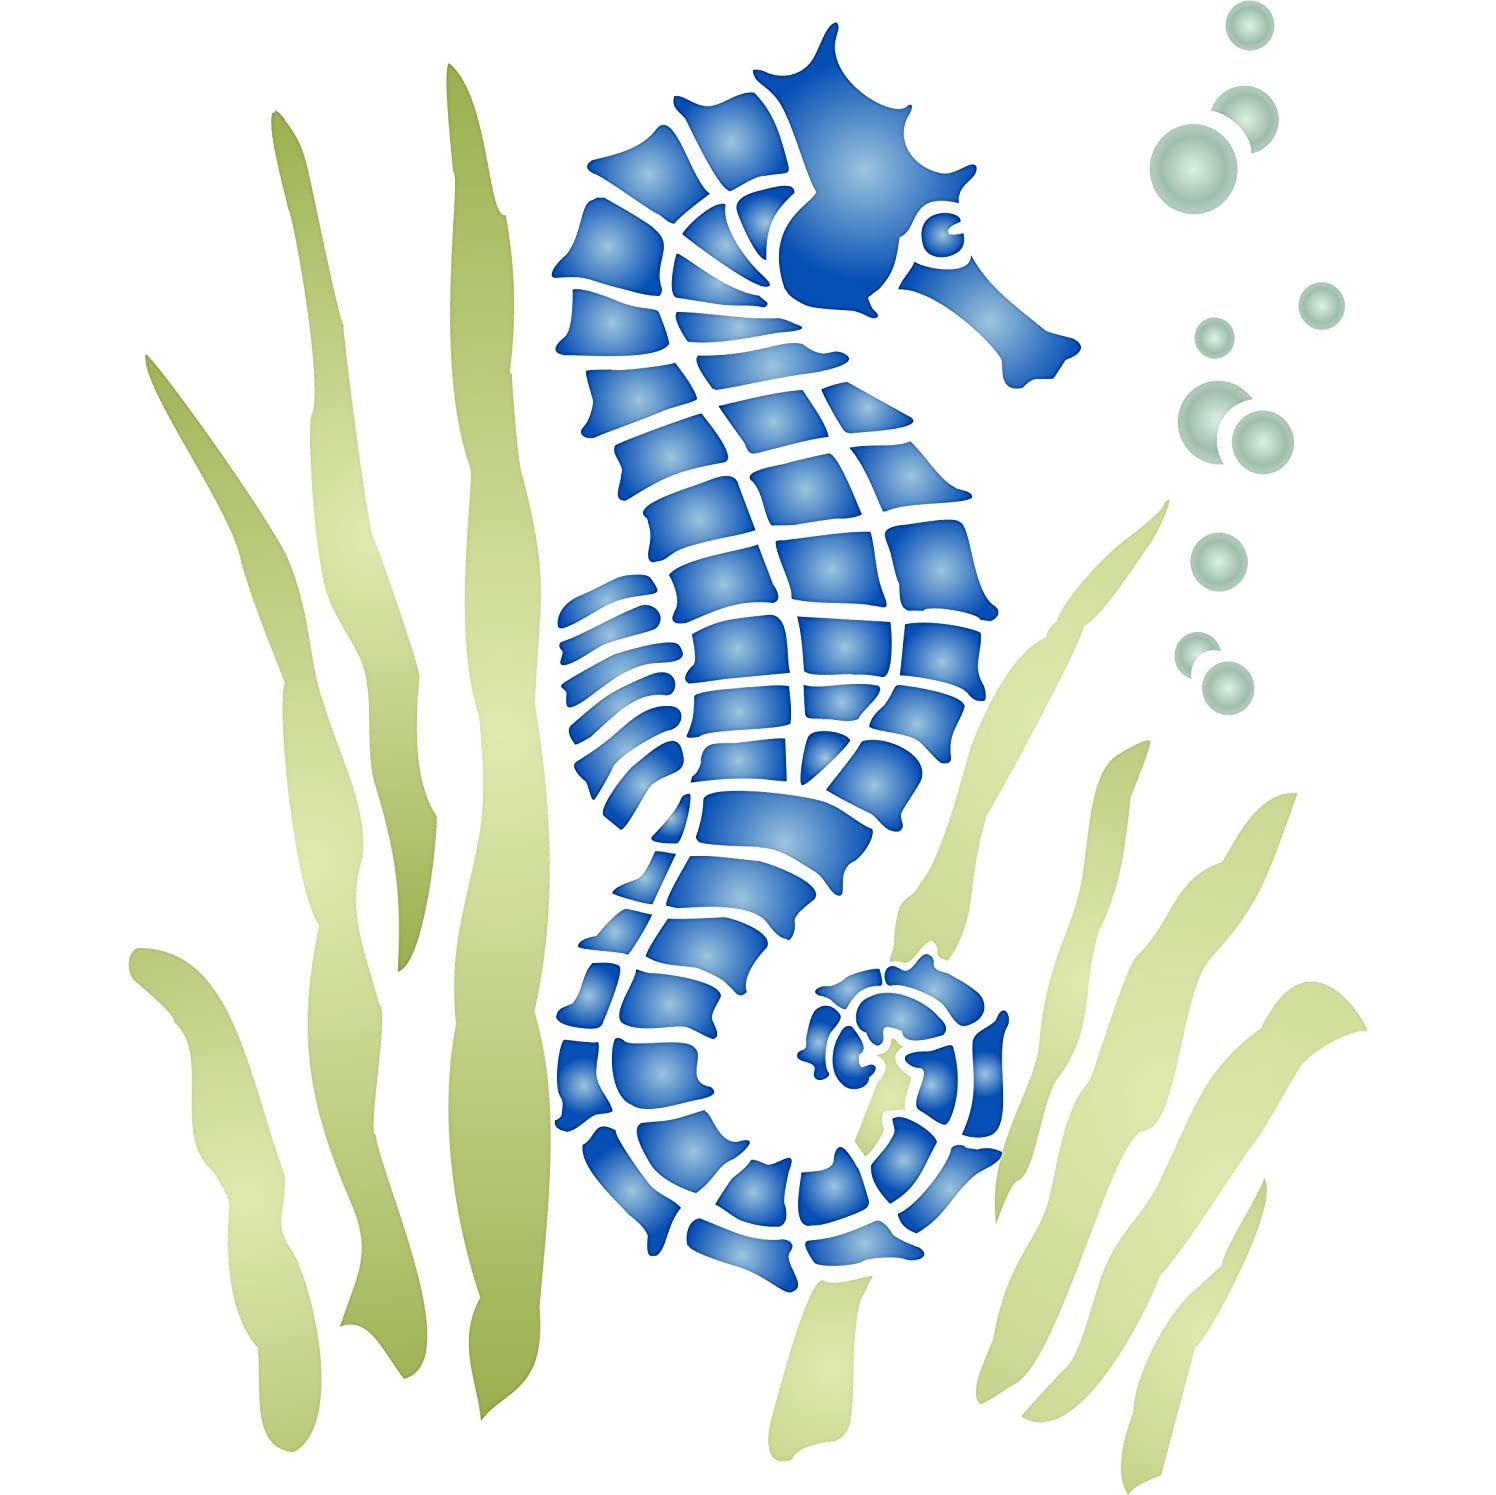 Seahorse Stencil (size 4.5